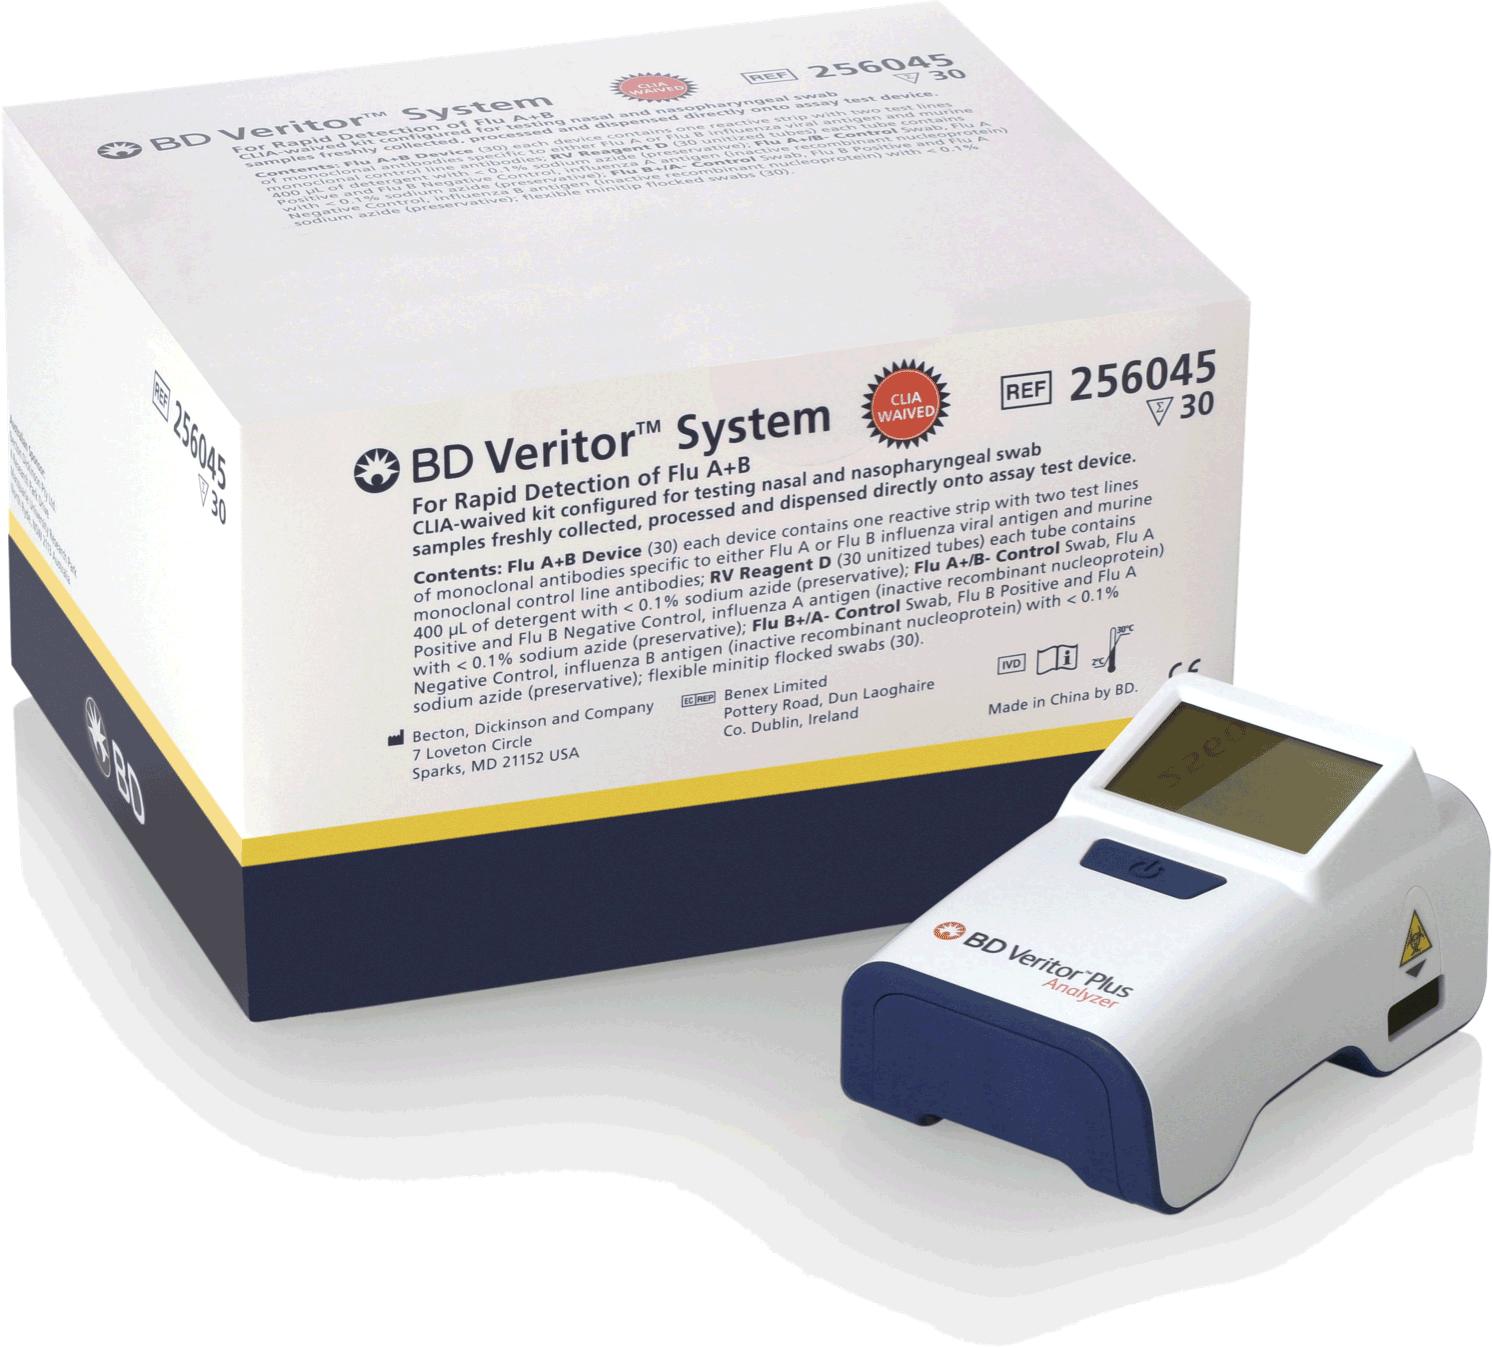 BD Veritor Flu A+B kit and the BD Veritor Plus Analyzer